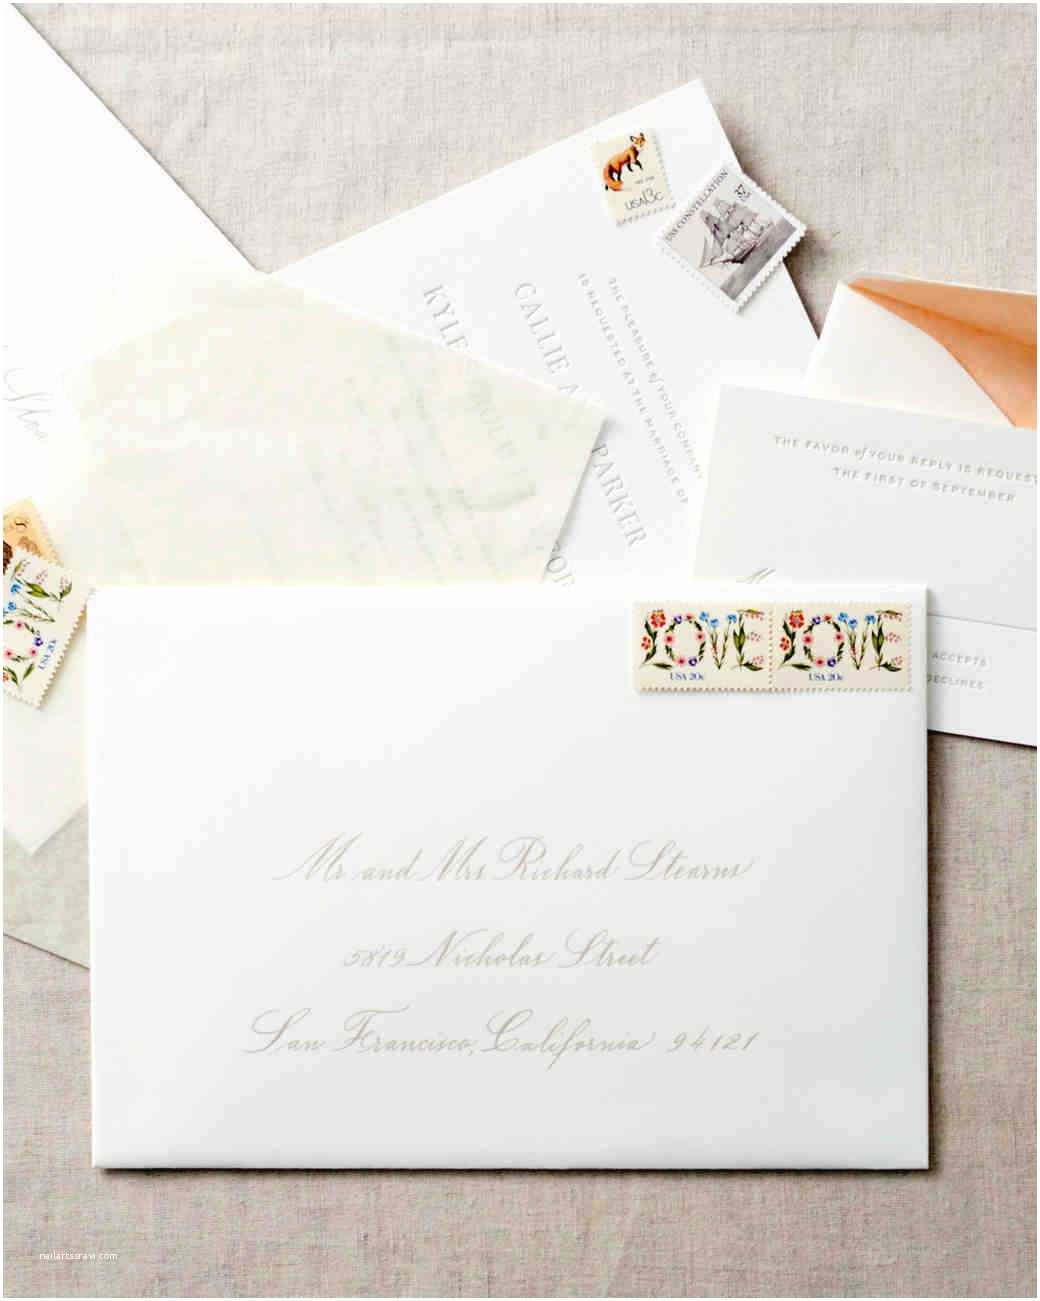 Wedding Invitations Etiquette Addressing Envelopes Wedding Invitation Etiquette Guest Plus E Yaseen for